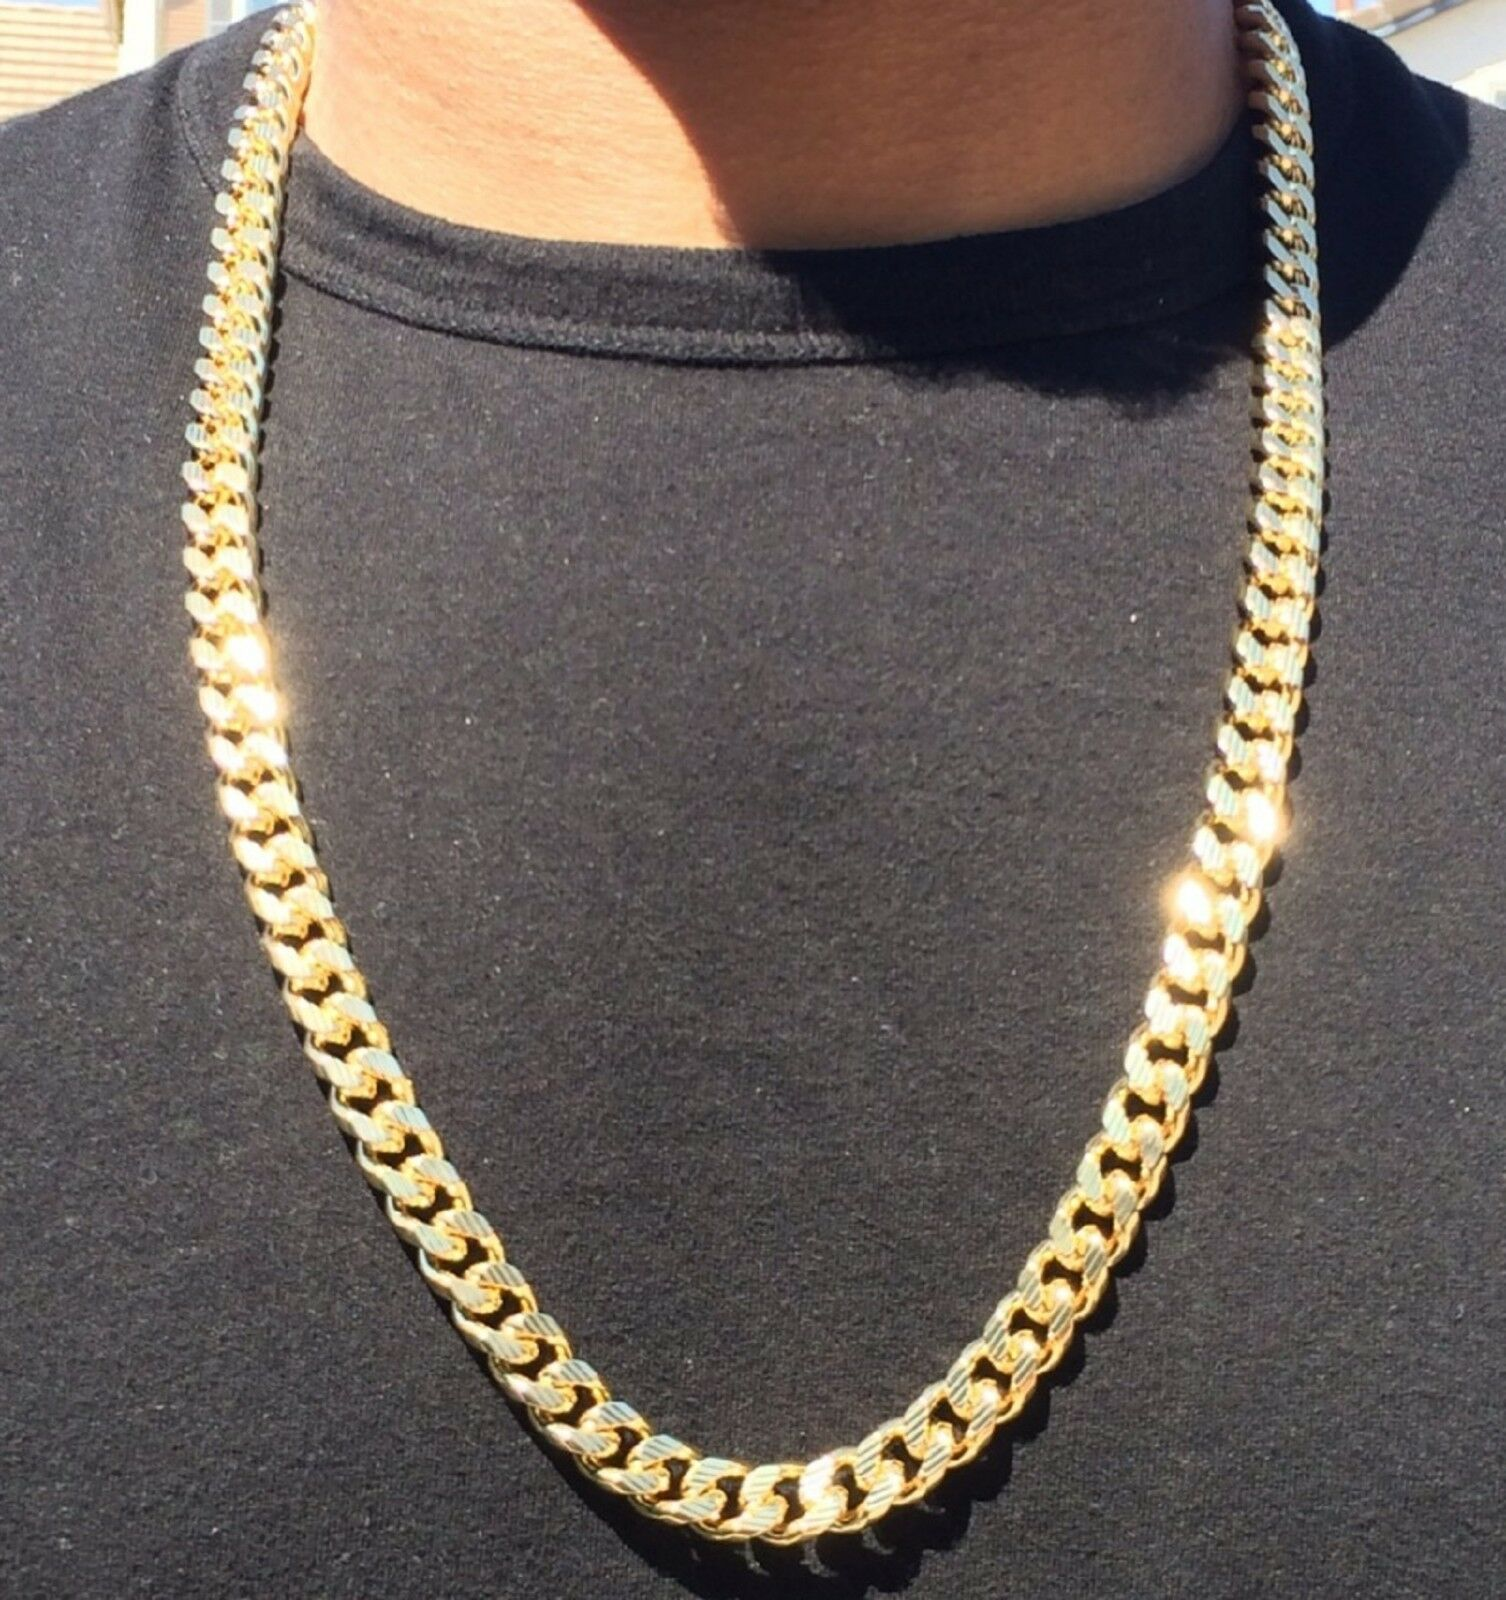 14k Gold Cuban Link Curb Chain With Diamond Cuts